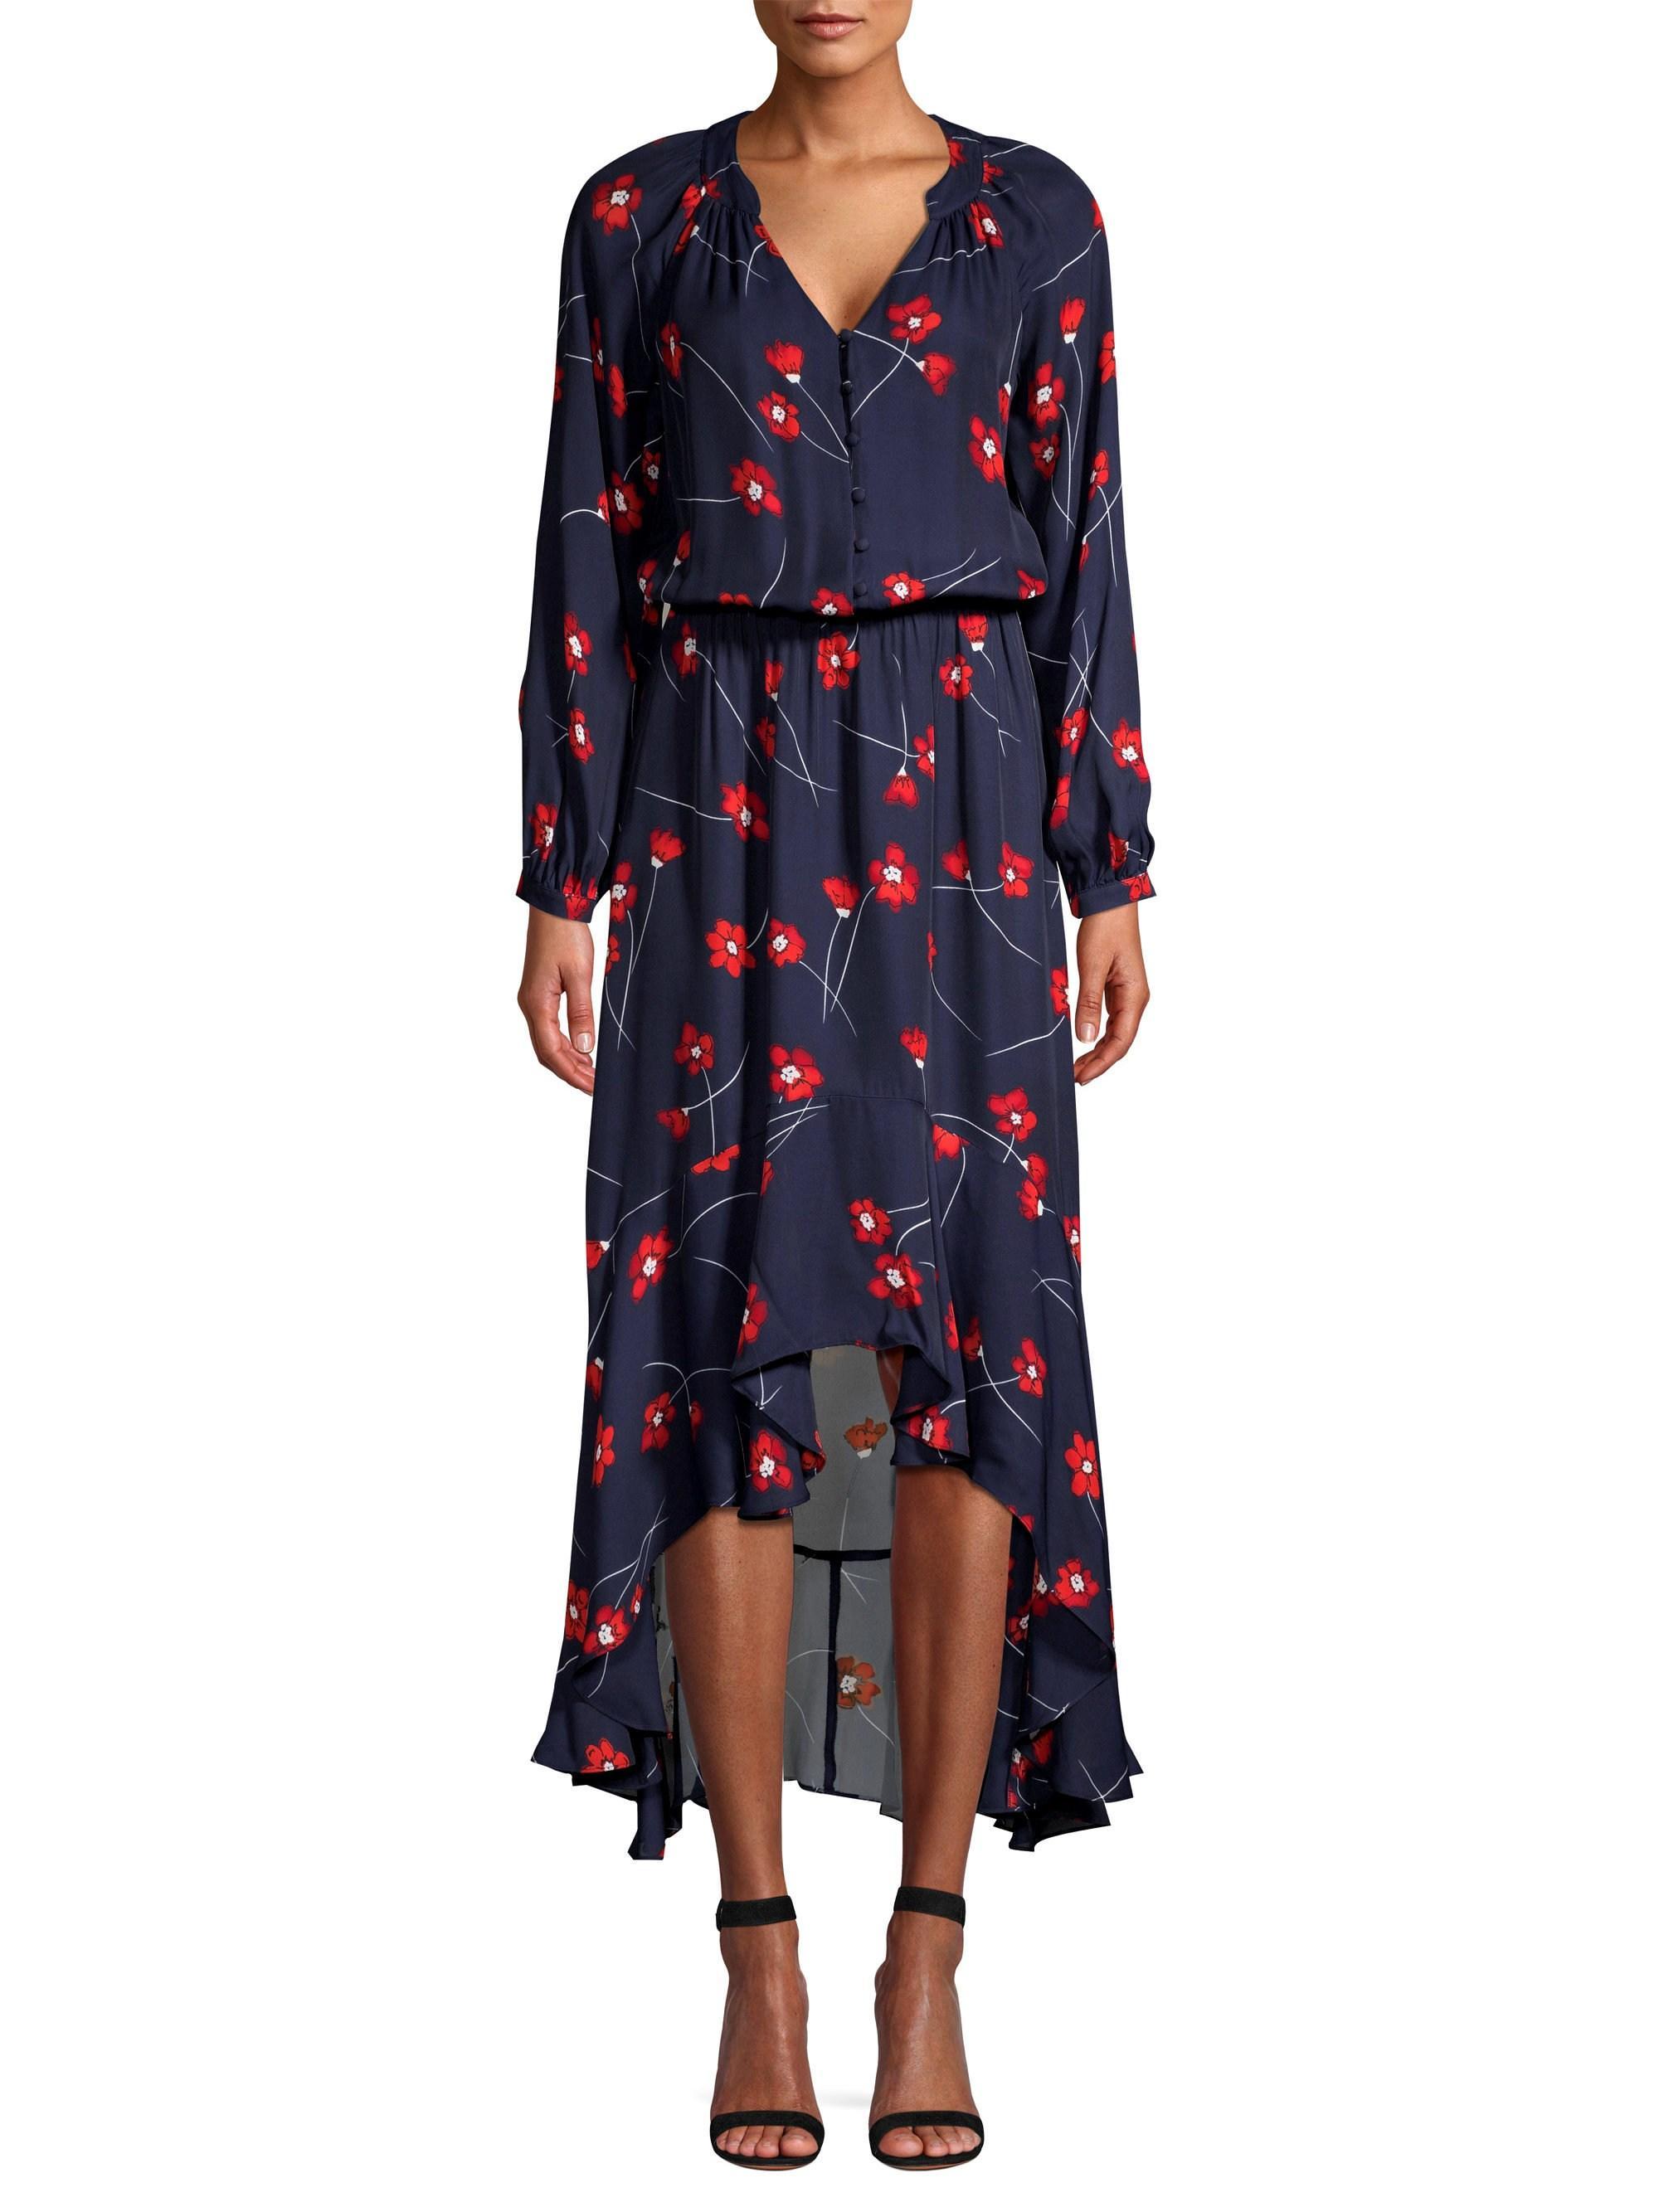 7bb2fd6894 Parker Women s Verity Silk Blend High-low Shirtdress - Aquarius Poppies -  Size Xxs in Blue - Lyst